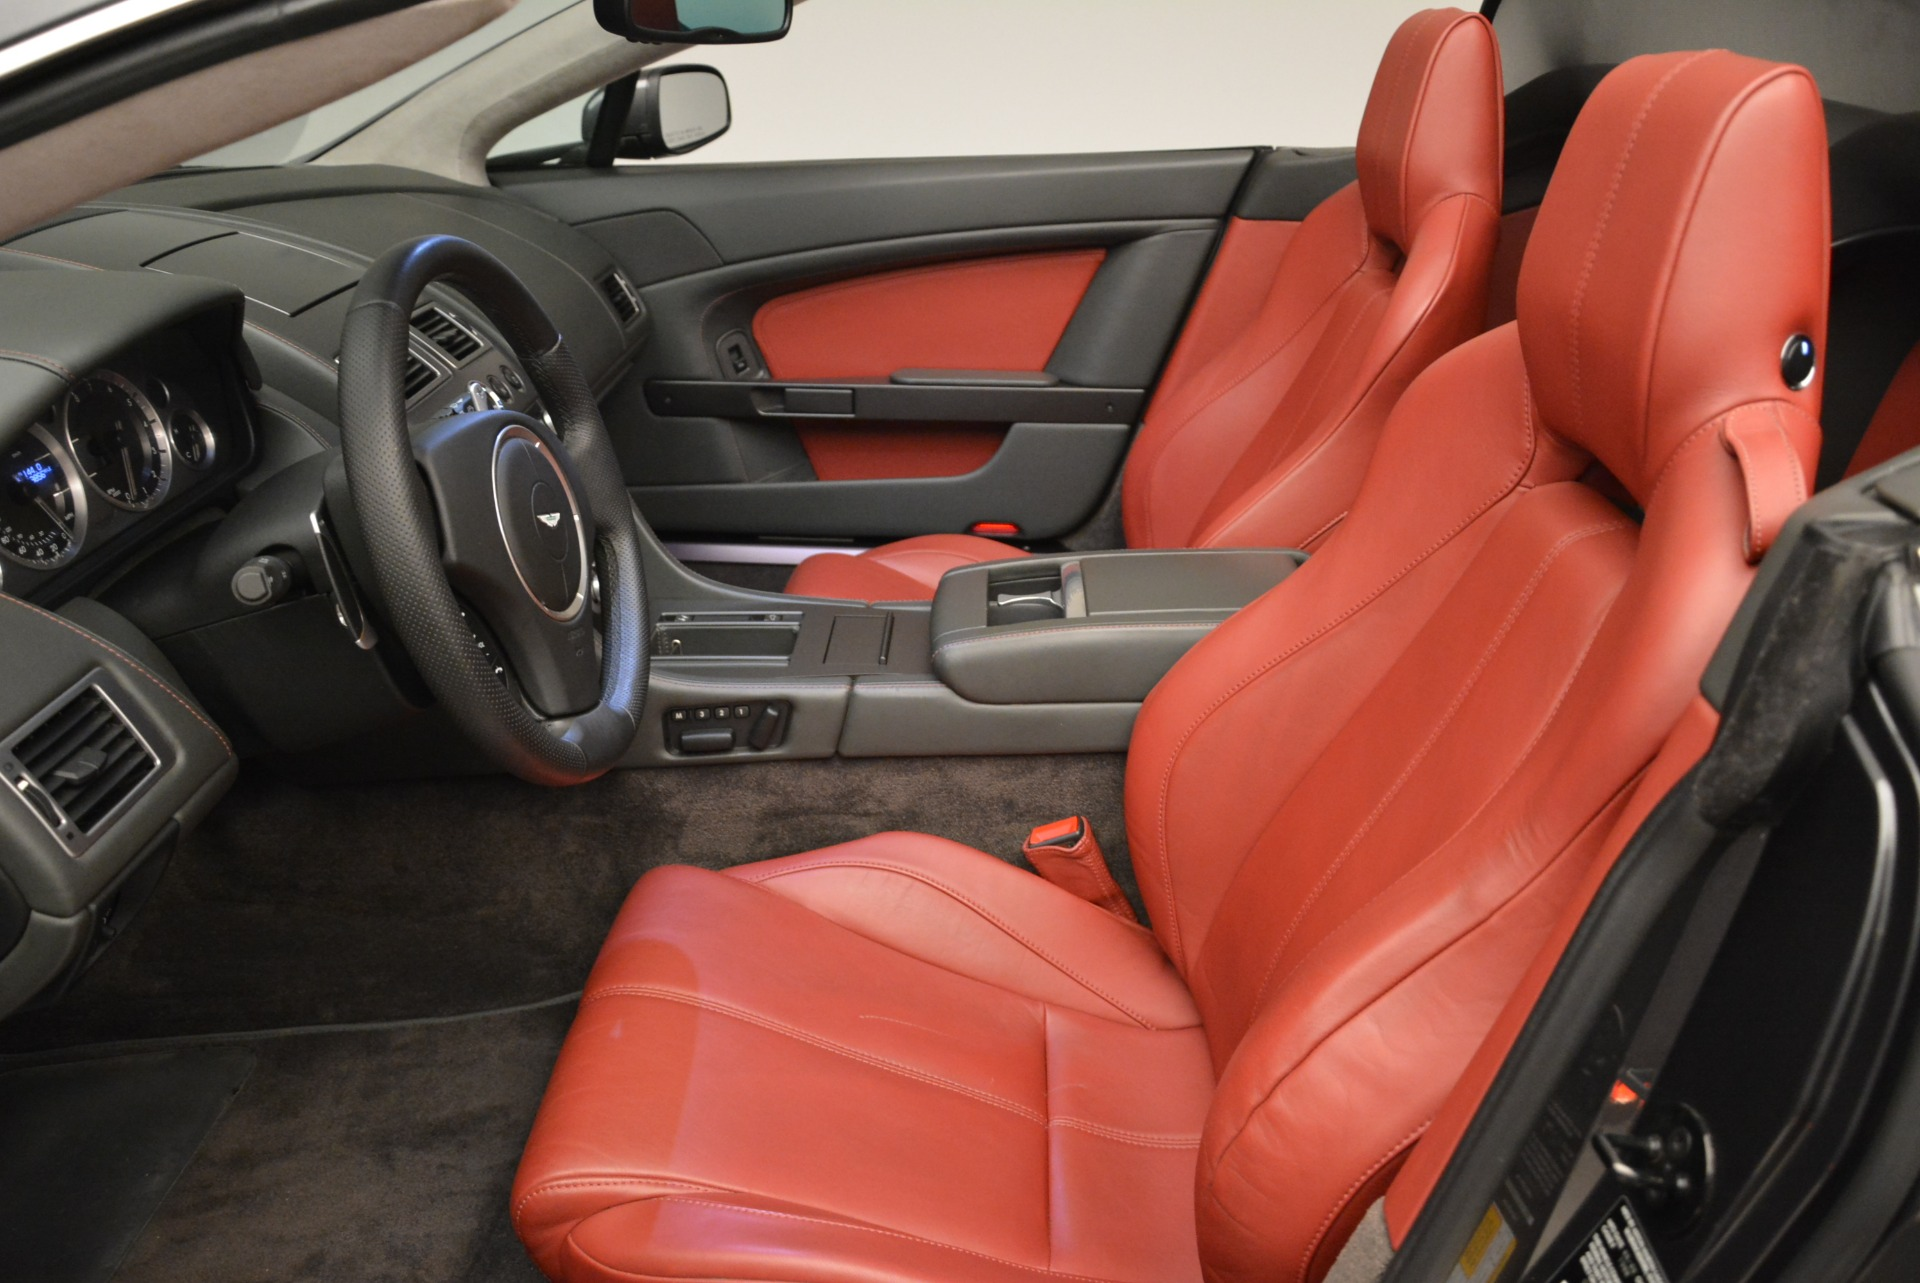 Used 2009 Aston Martin V8 Vantage Roadster For Sale In Westport, CT 2123_p25